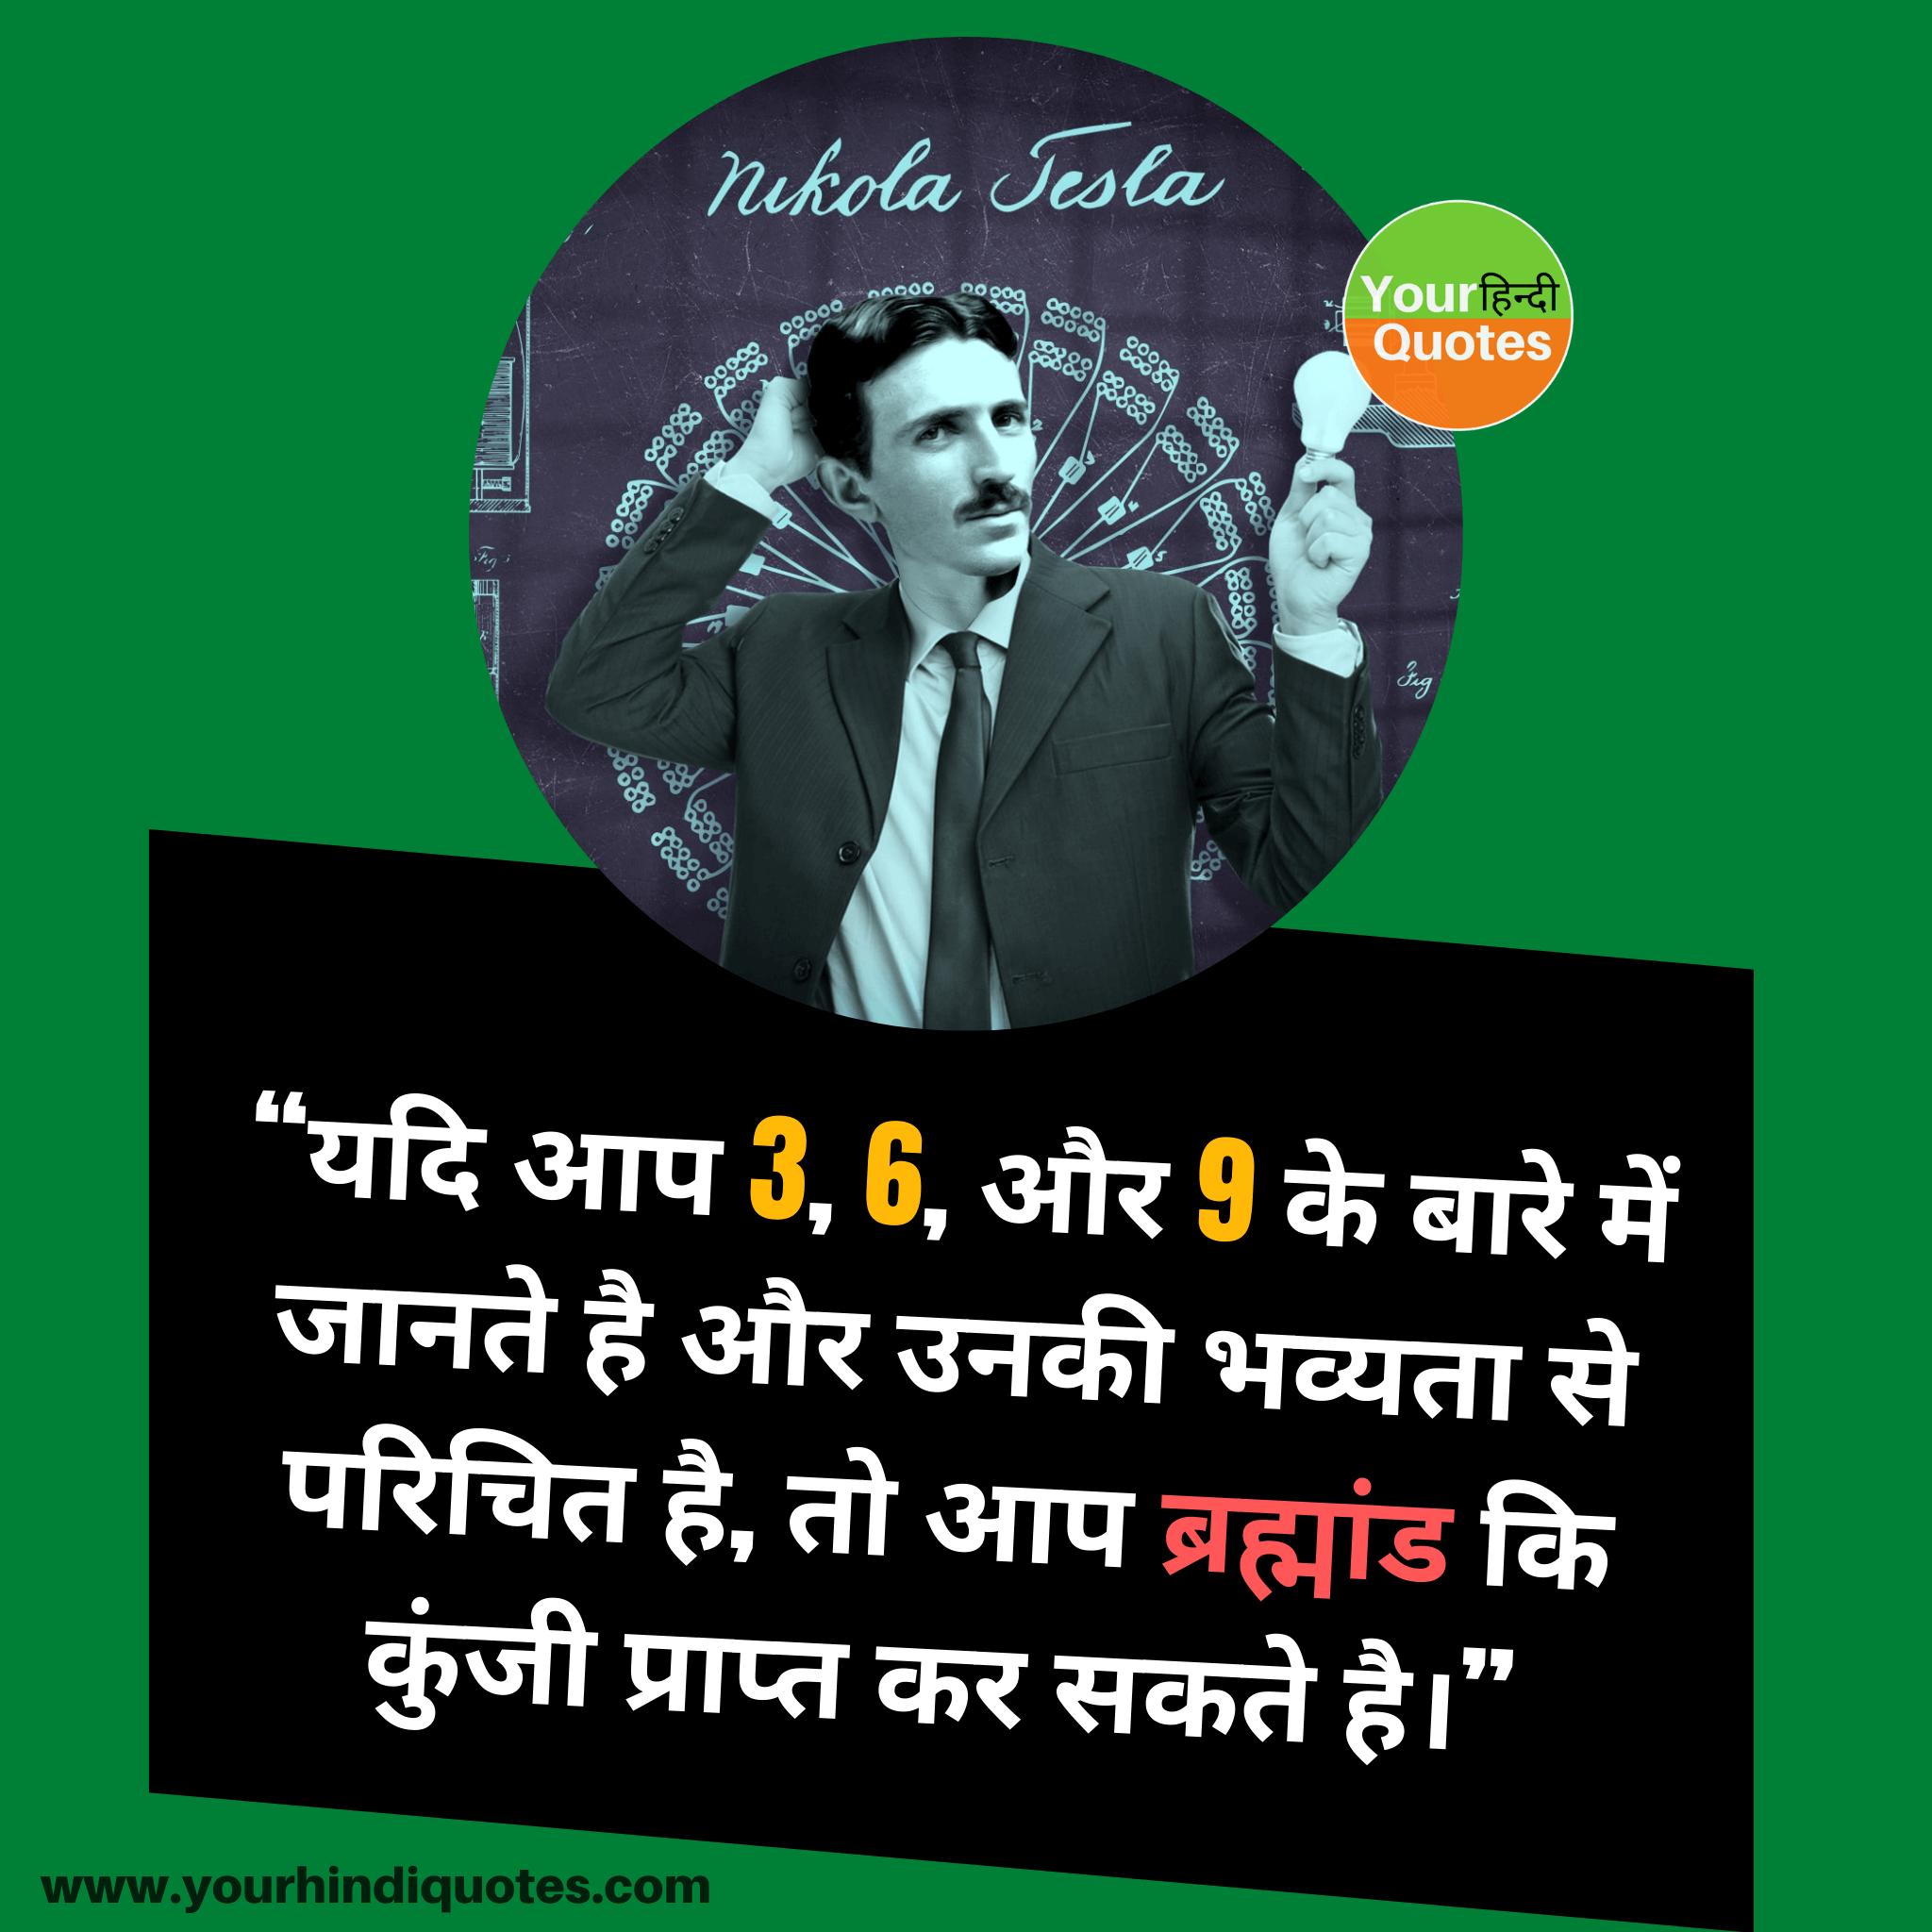 Nikola Tesla Hindi Quotes Image